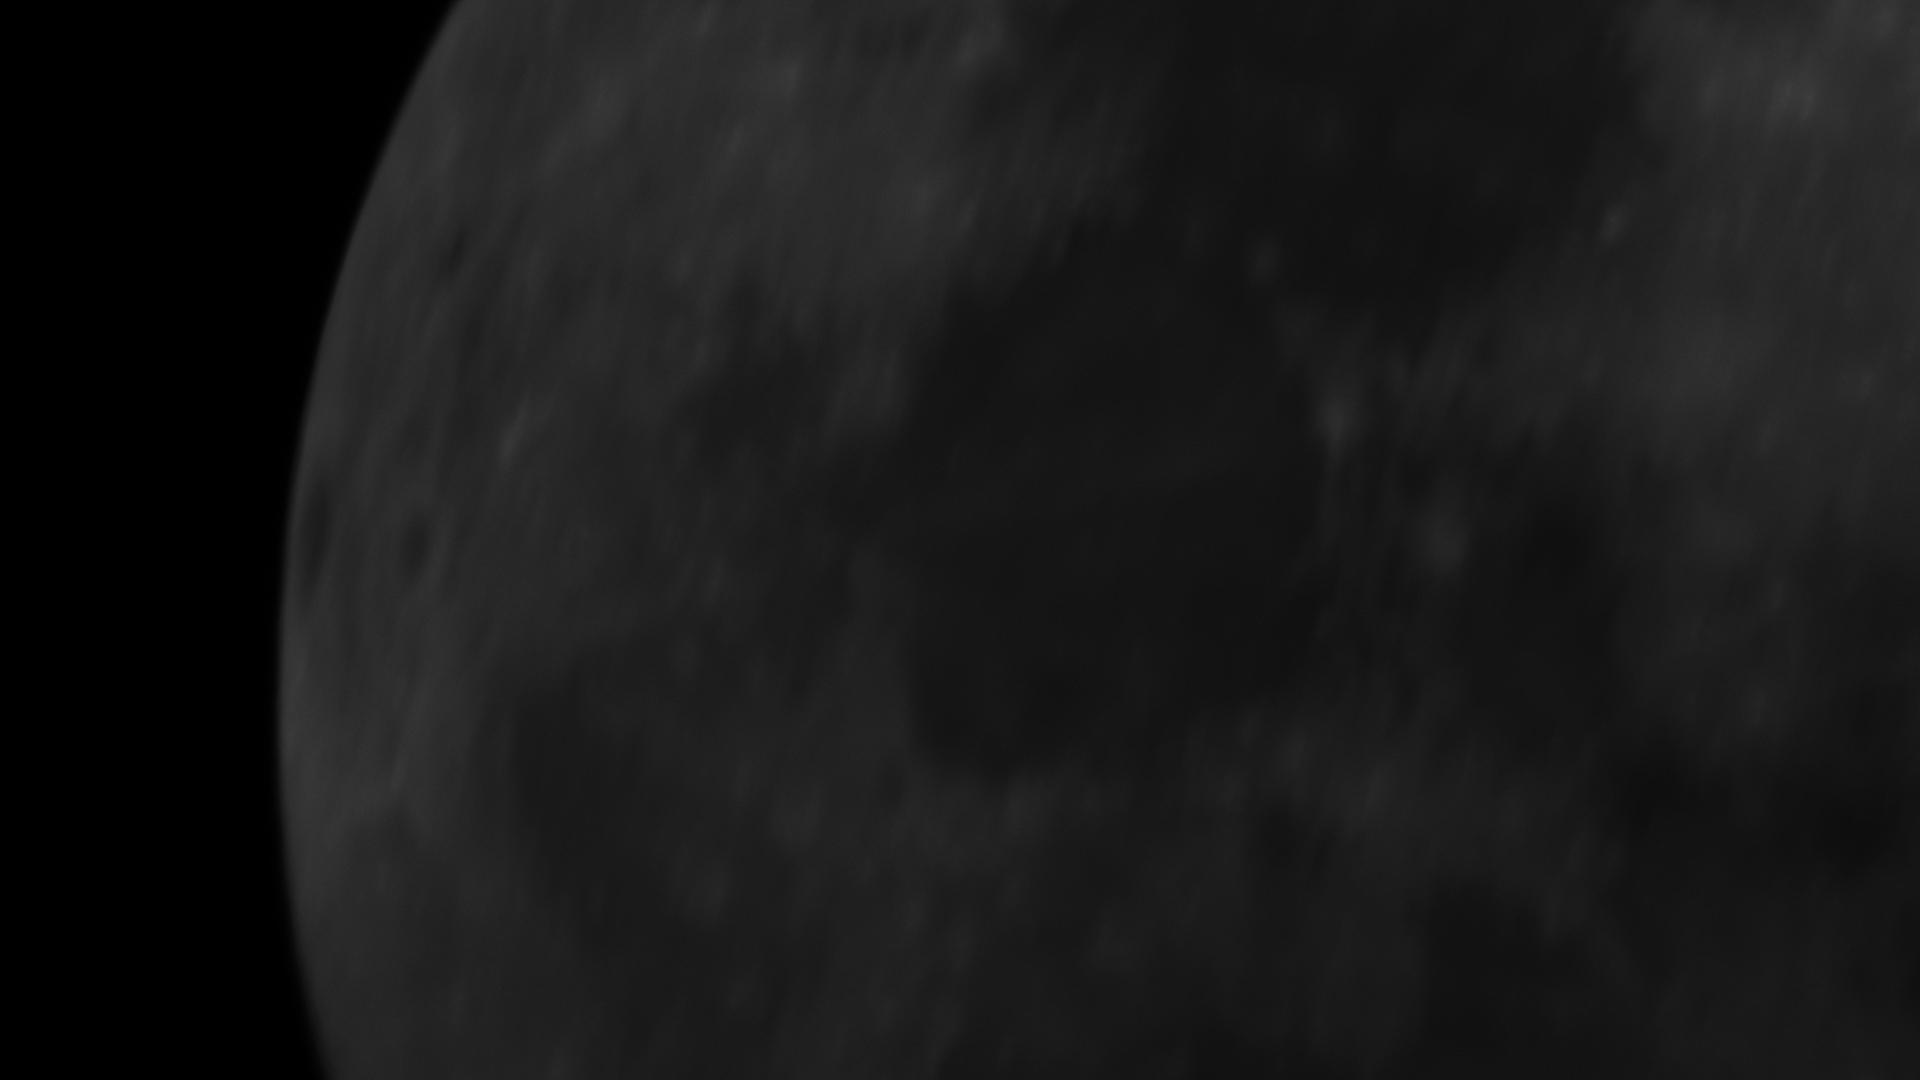 Lune.jpg.598aa8f12ac1236b7dadb059294e75f7.jpg